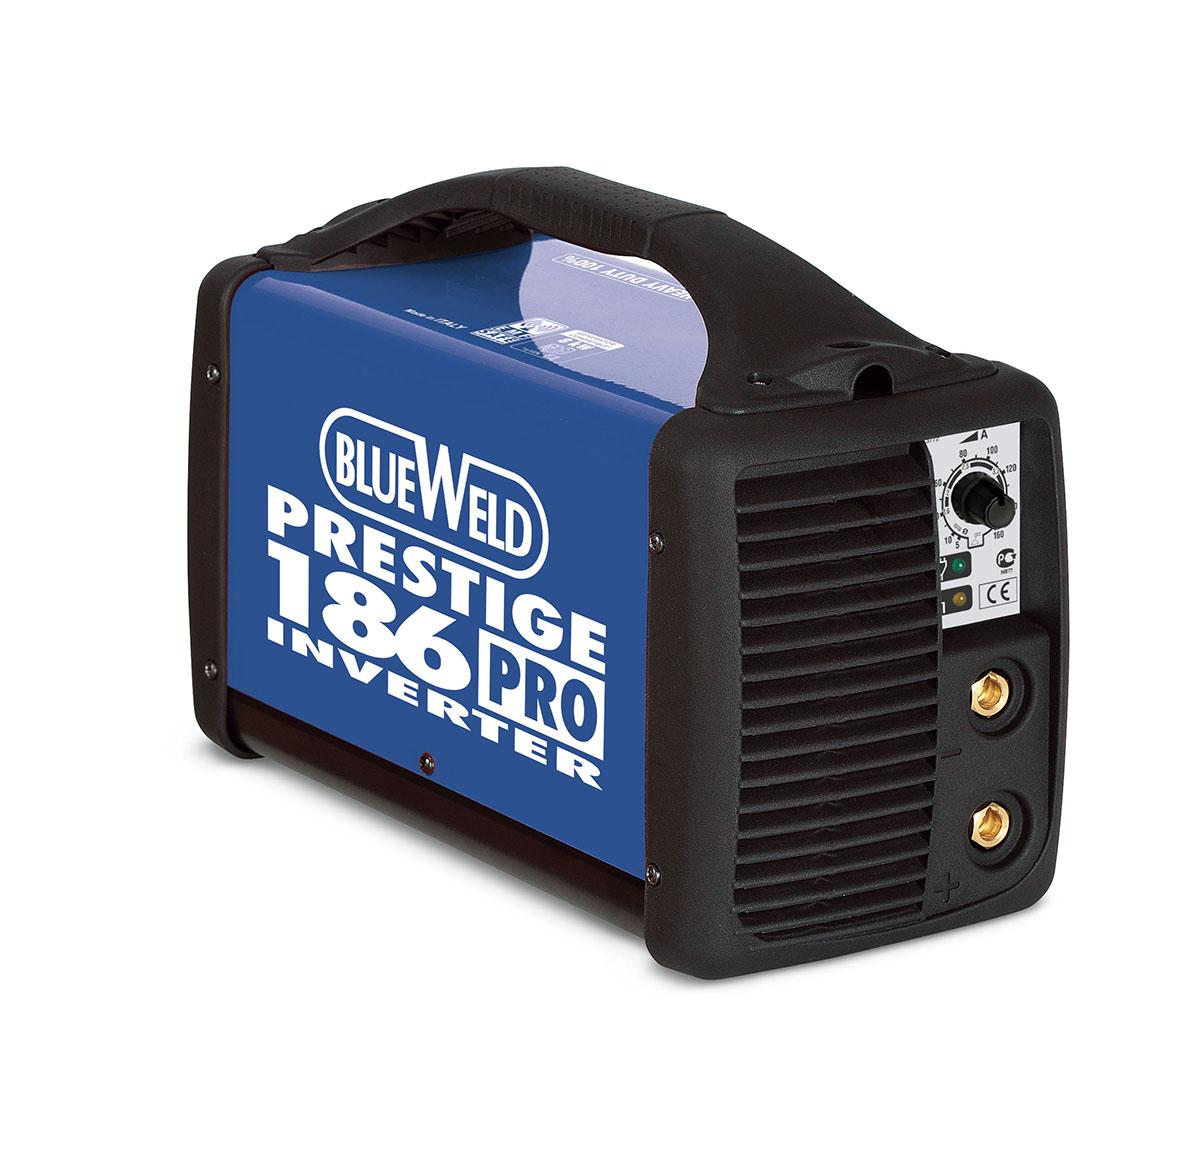 Сварочный аппарат Blue weld 186 pro